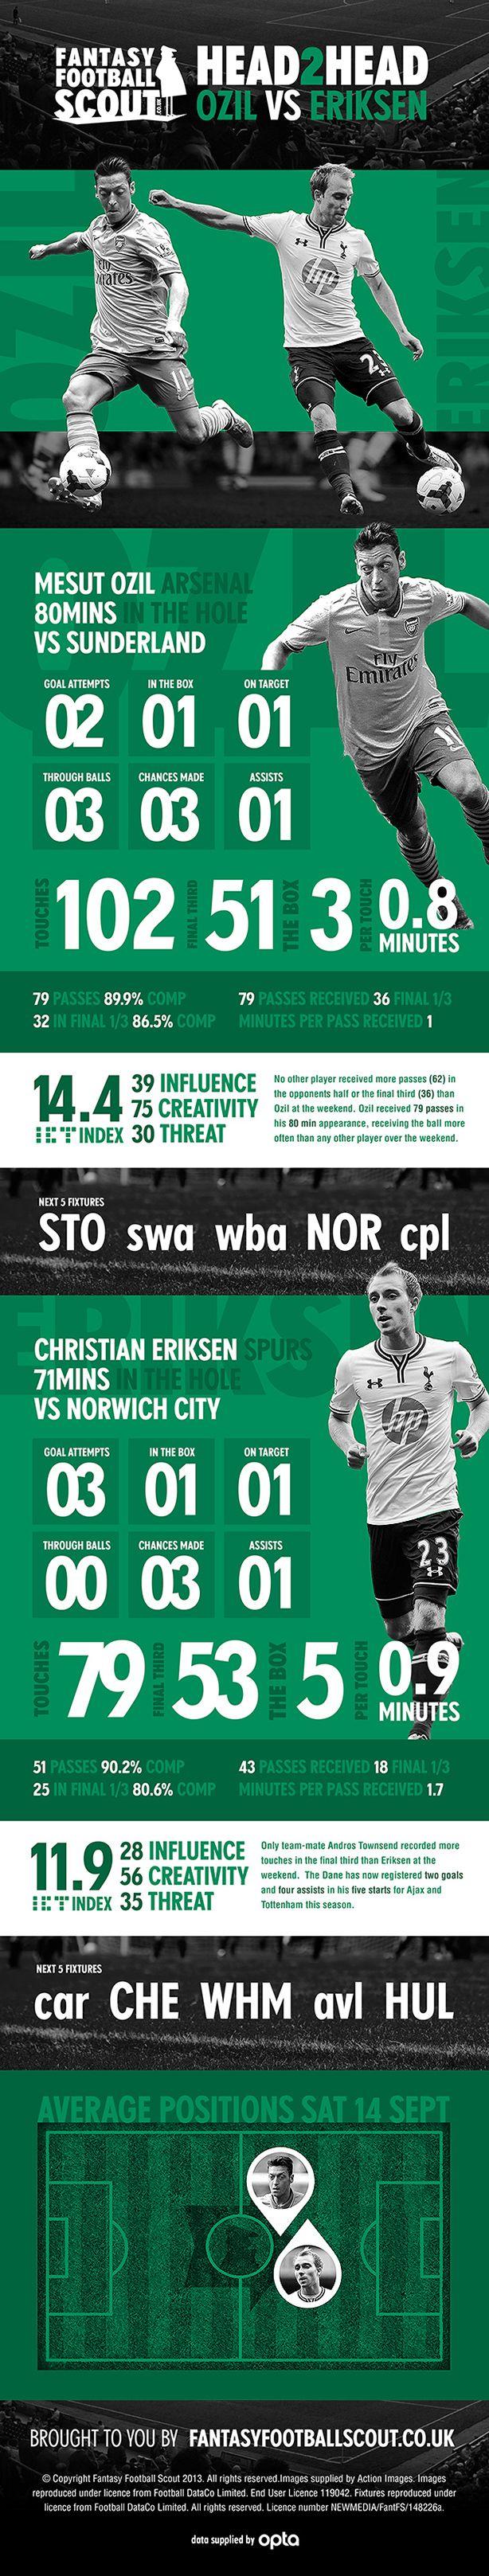 Fantasy Football Scout Head2Head: Ozil vs Eriksen Infographic - read in full here: http://www.fantasyfootballscout.co.uk/2013/09/16/head-to-head-ozil-vs-eriksen/